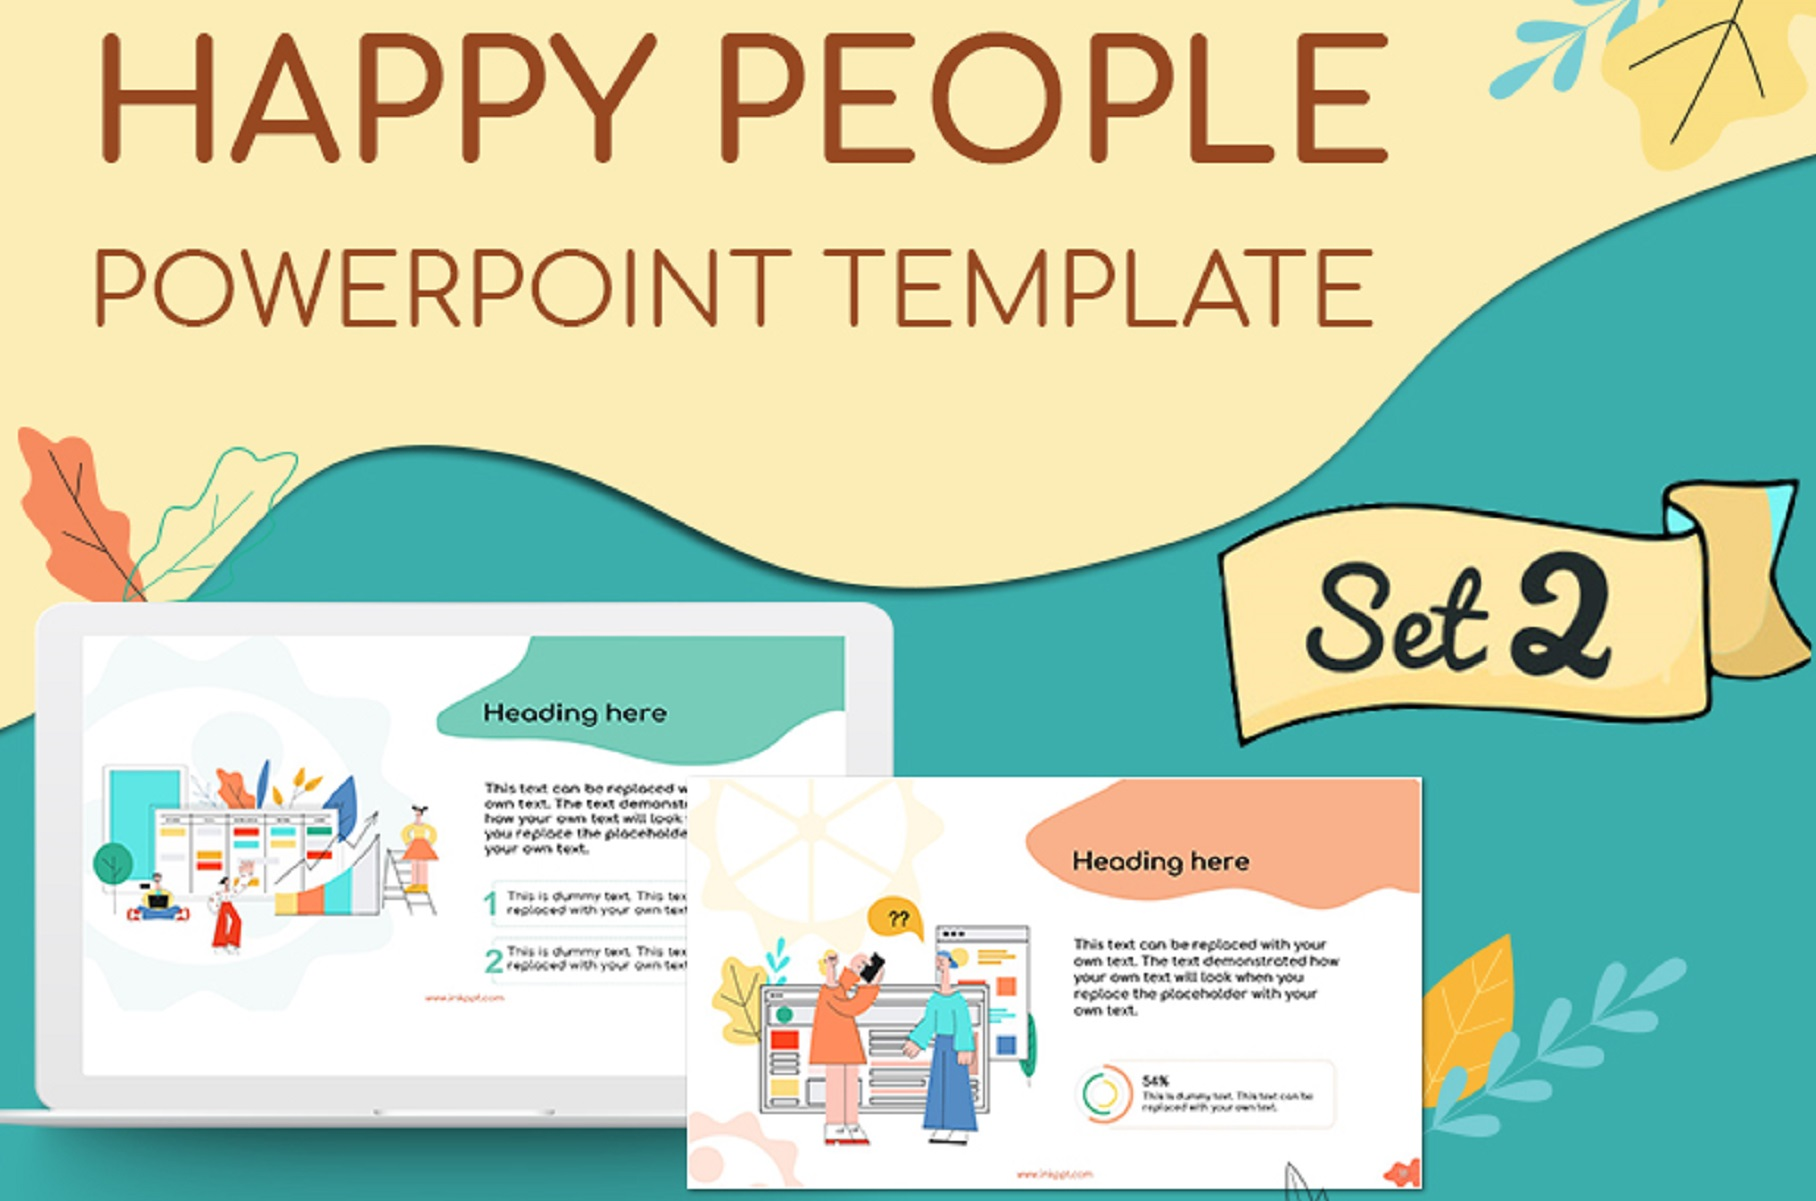 Happy People Set 2 Presentation Template example image 1